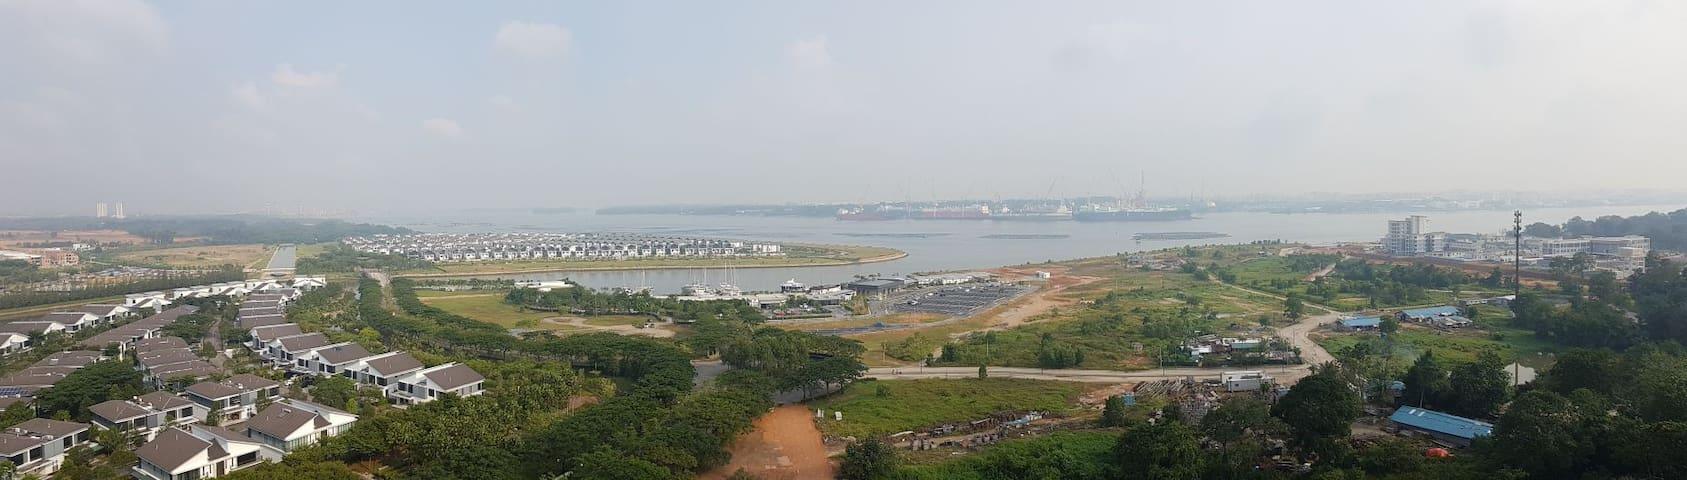 Wateredge Apartment - Senibong Cove Johor Bahru